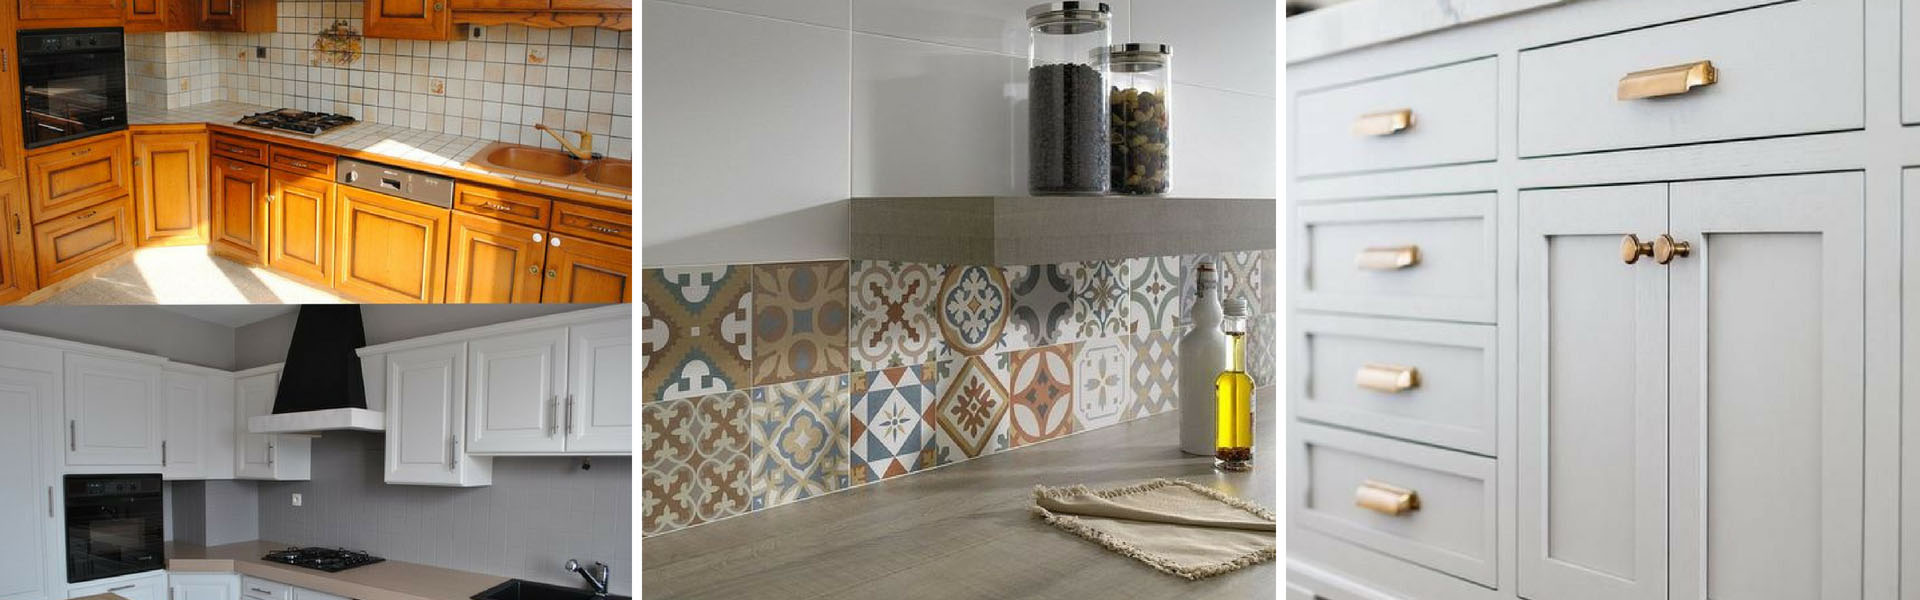 relooker sa cuisine sans tout d molir kalla cuisine design. Black Bedroom Furniture Sets. Home Design Ideas